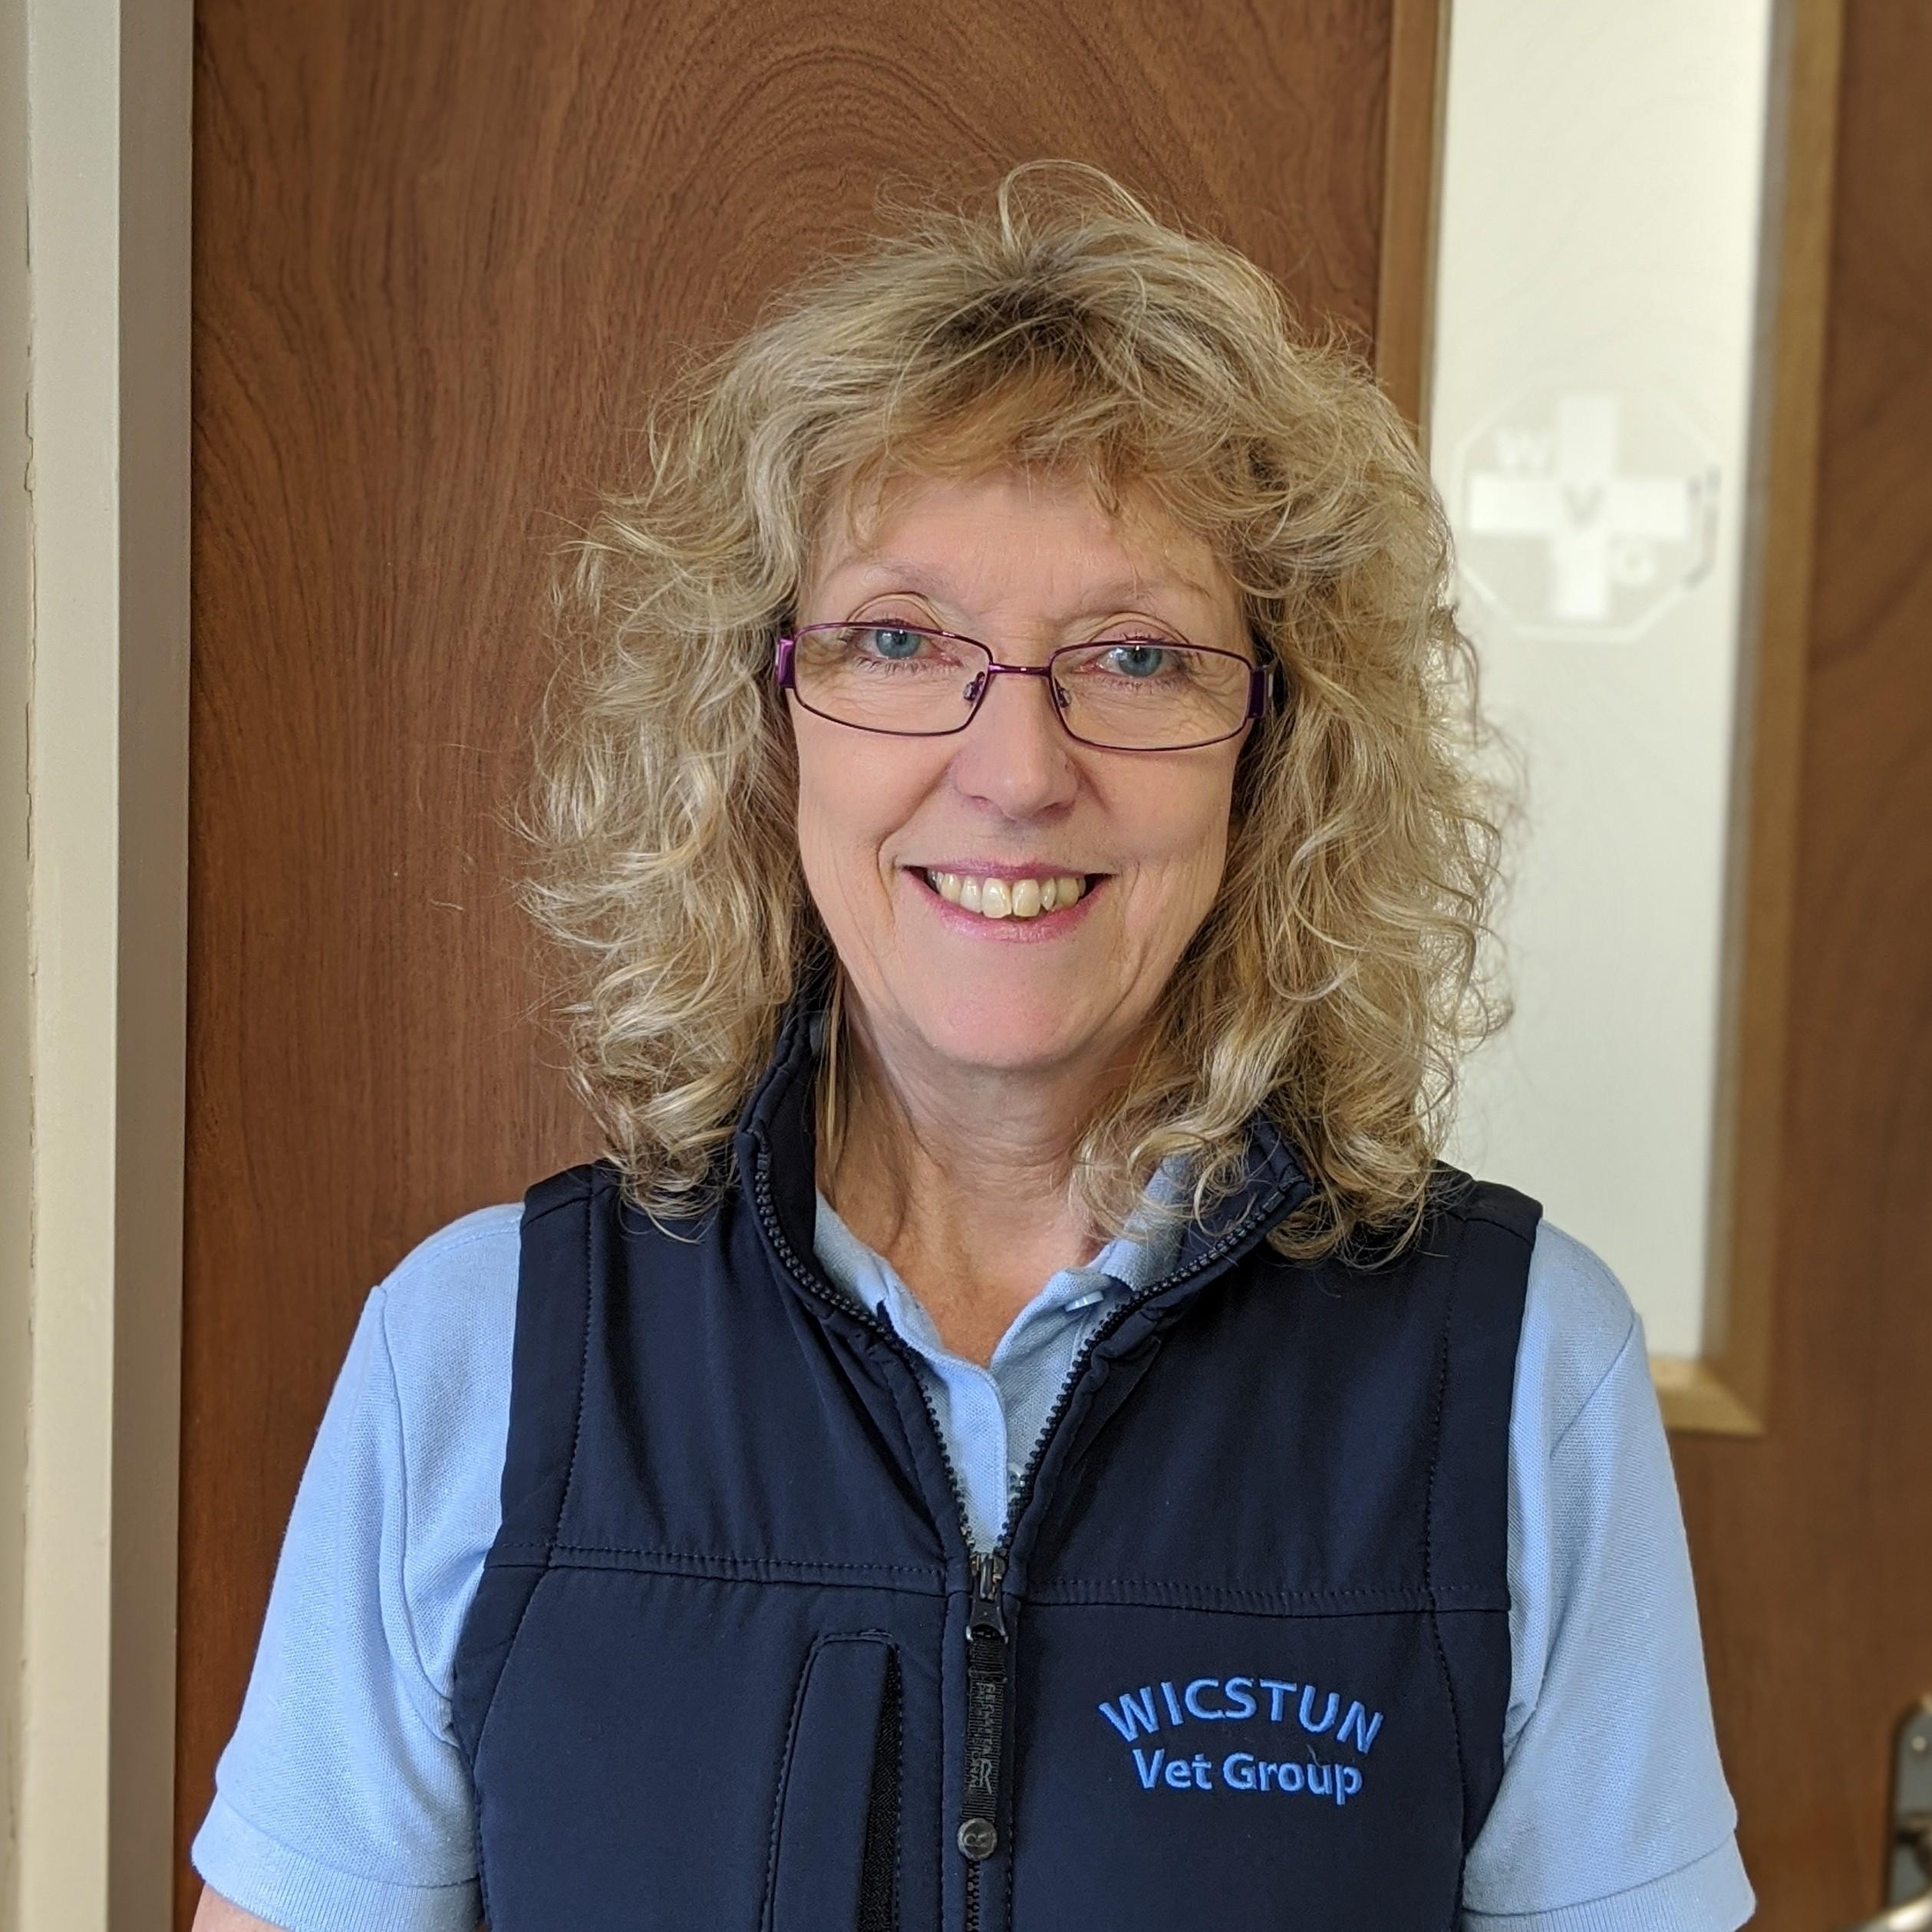 Anita Hunt - Practice Manager Wicstun Vet Group